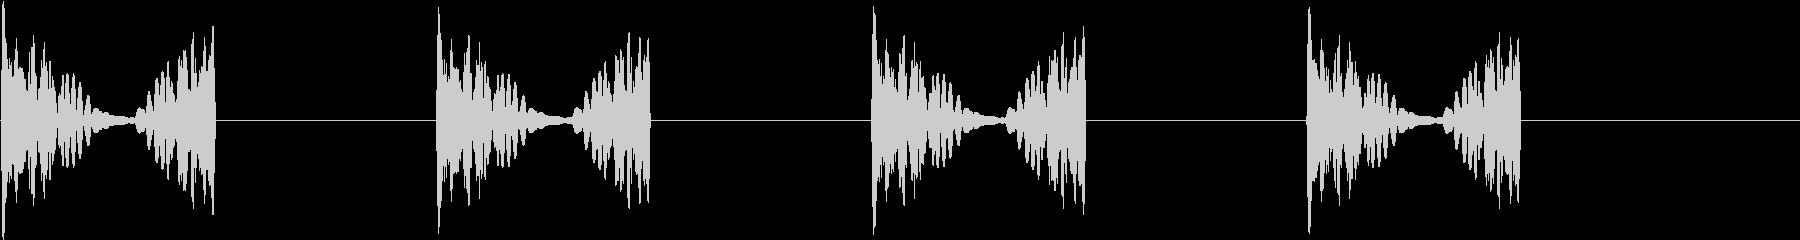 DJプレイ スクラッチ・ノイズ 23の未再生の波形